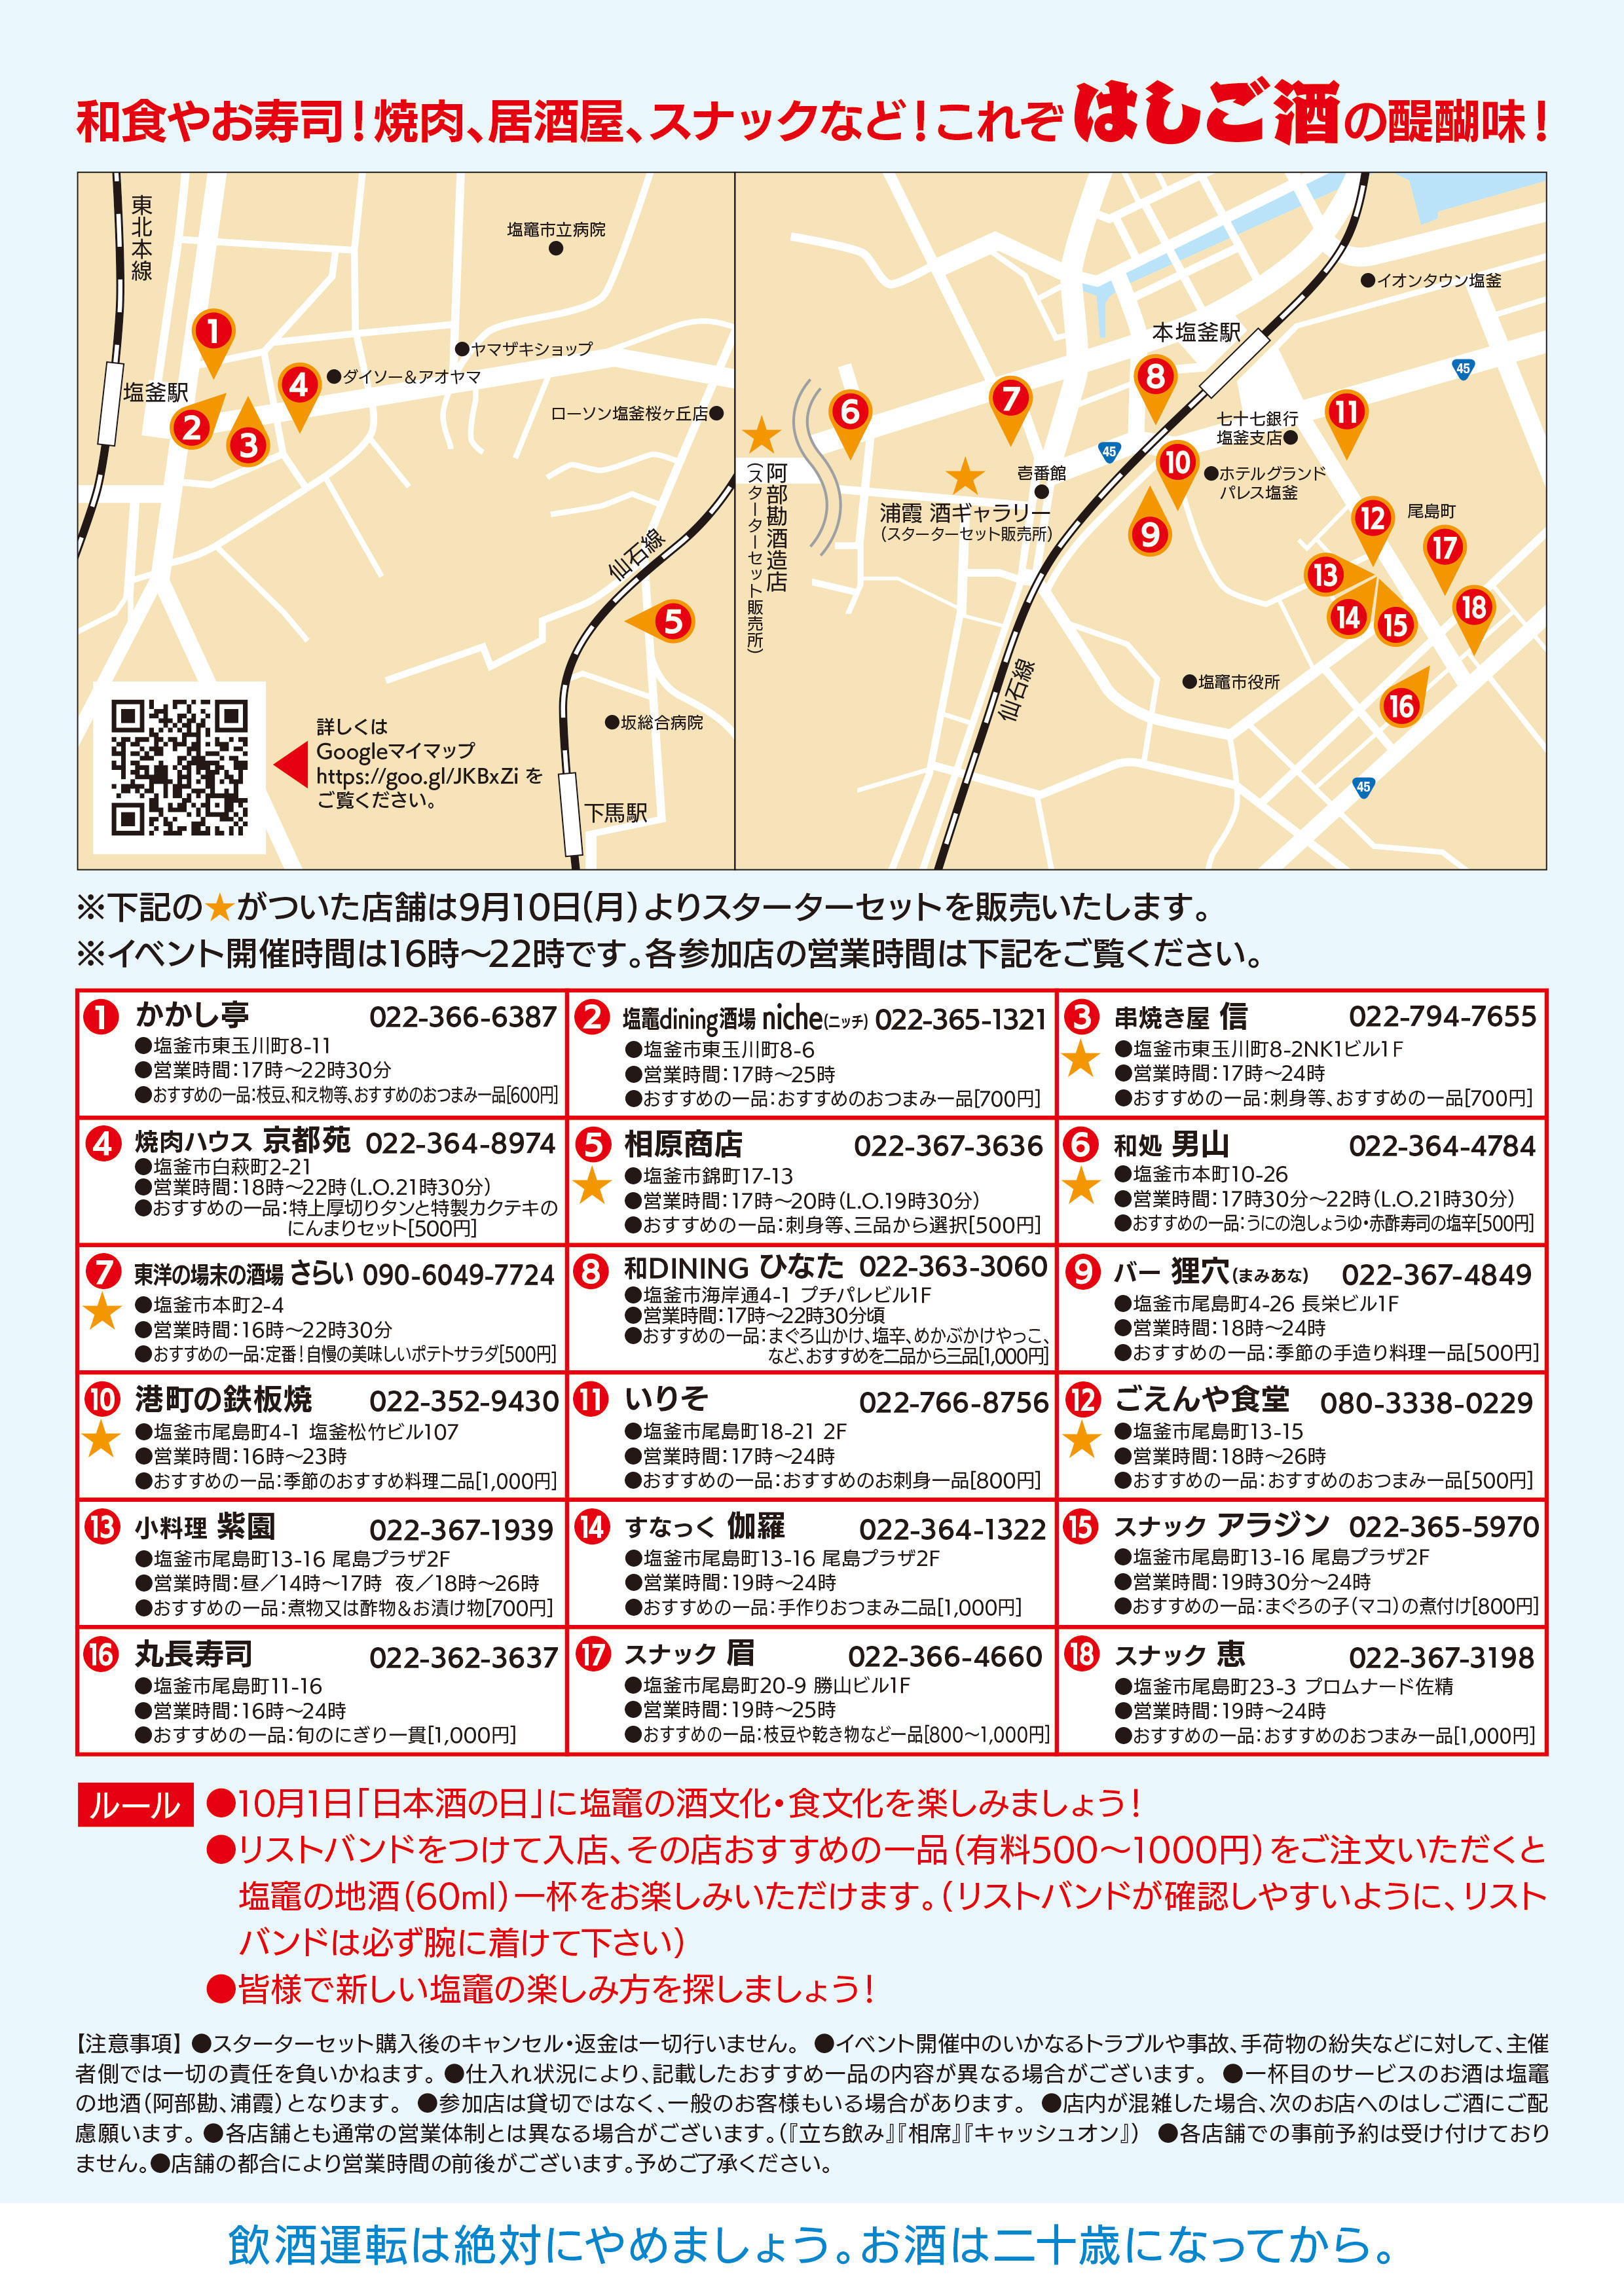 http://www.urakasumi.com/tayori/ura.jpg